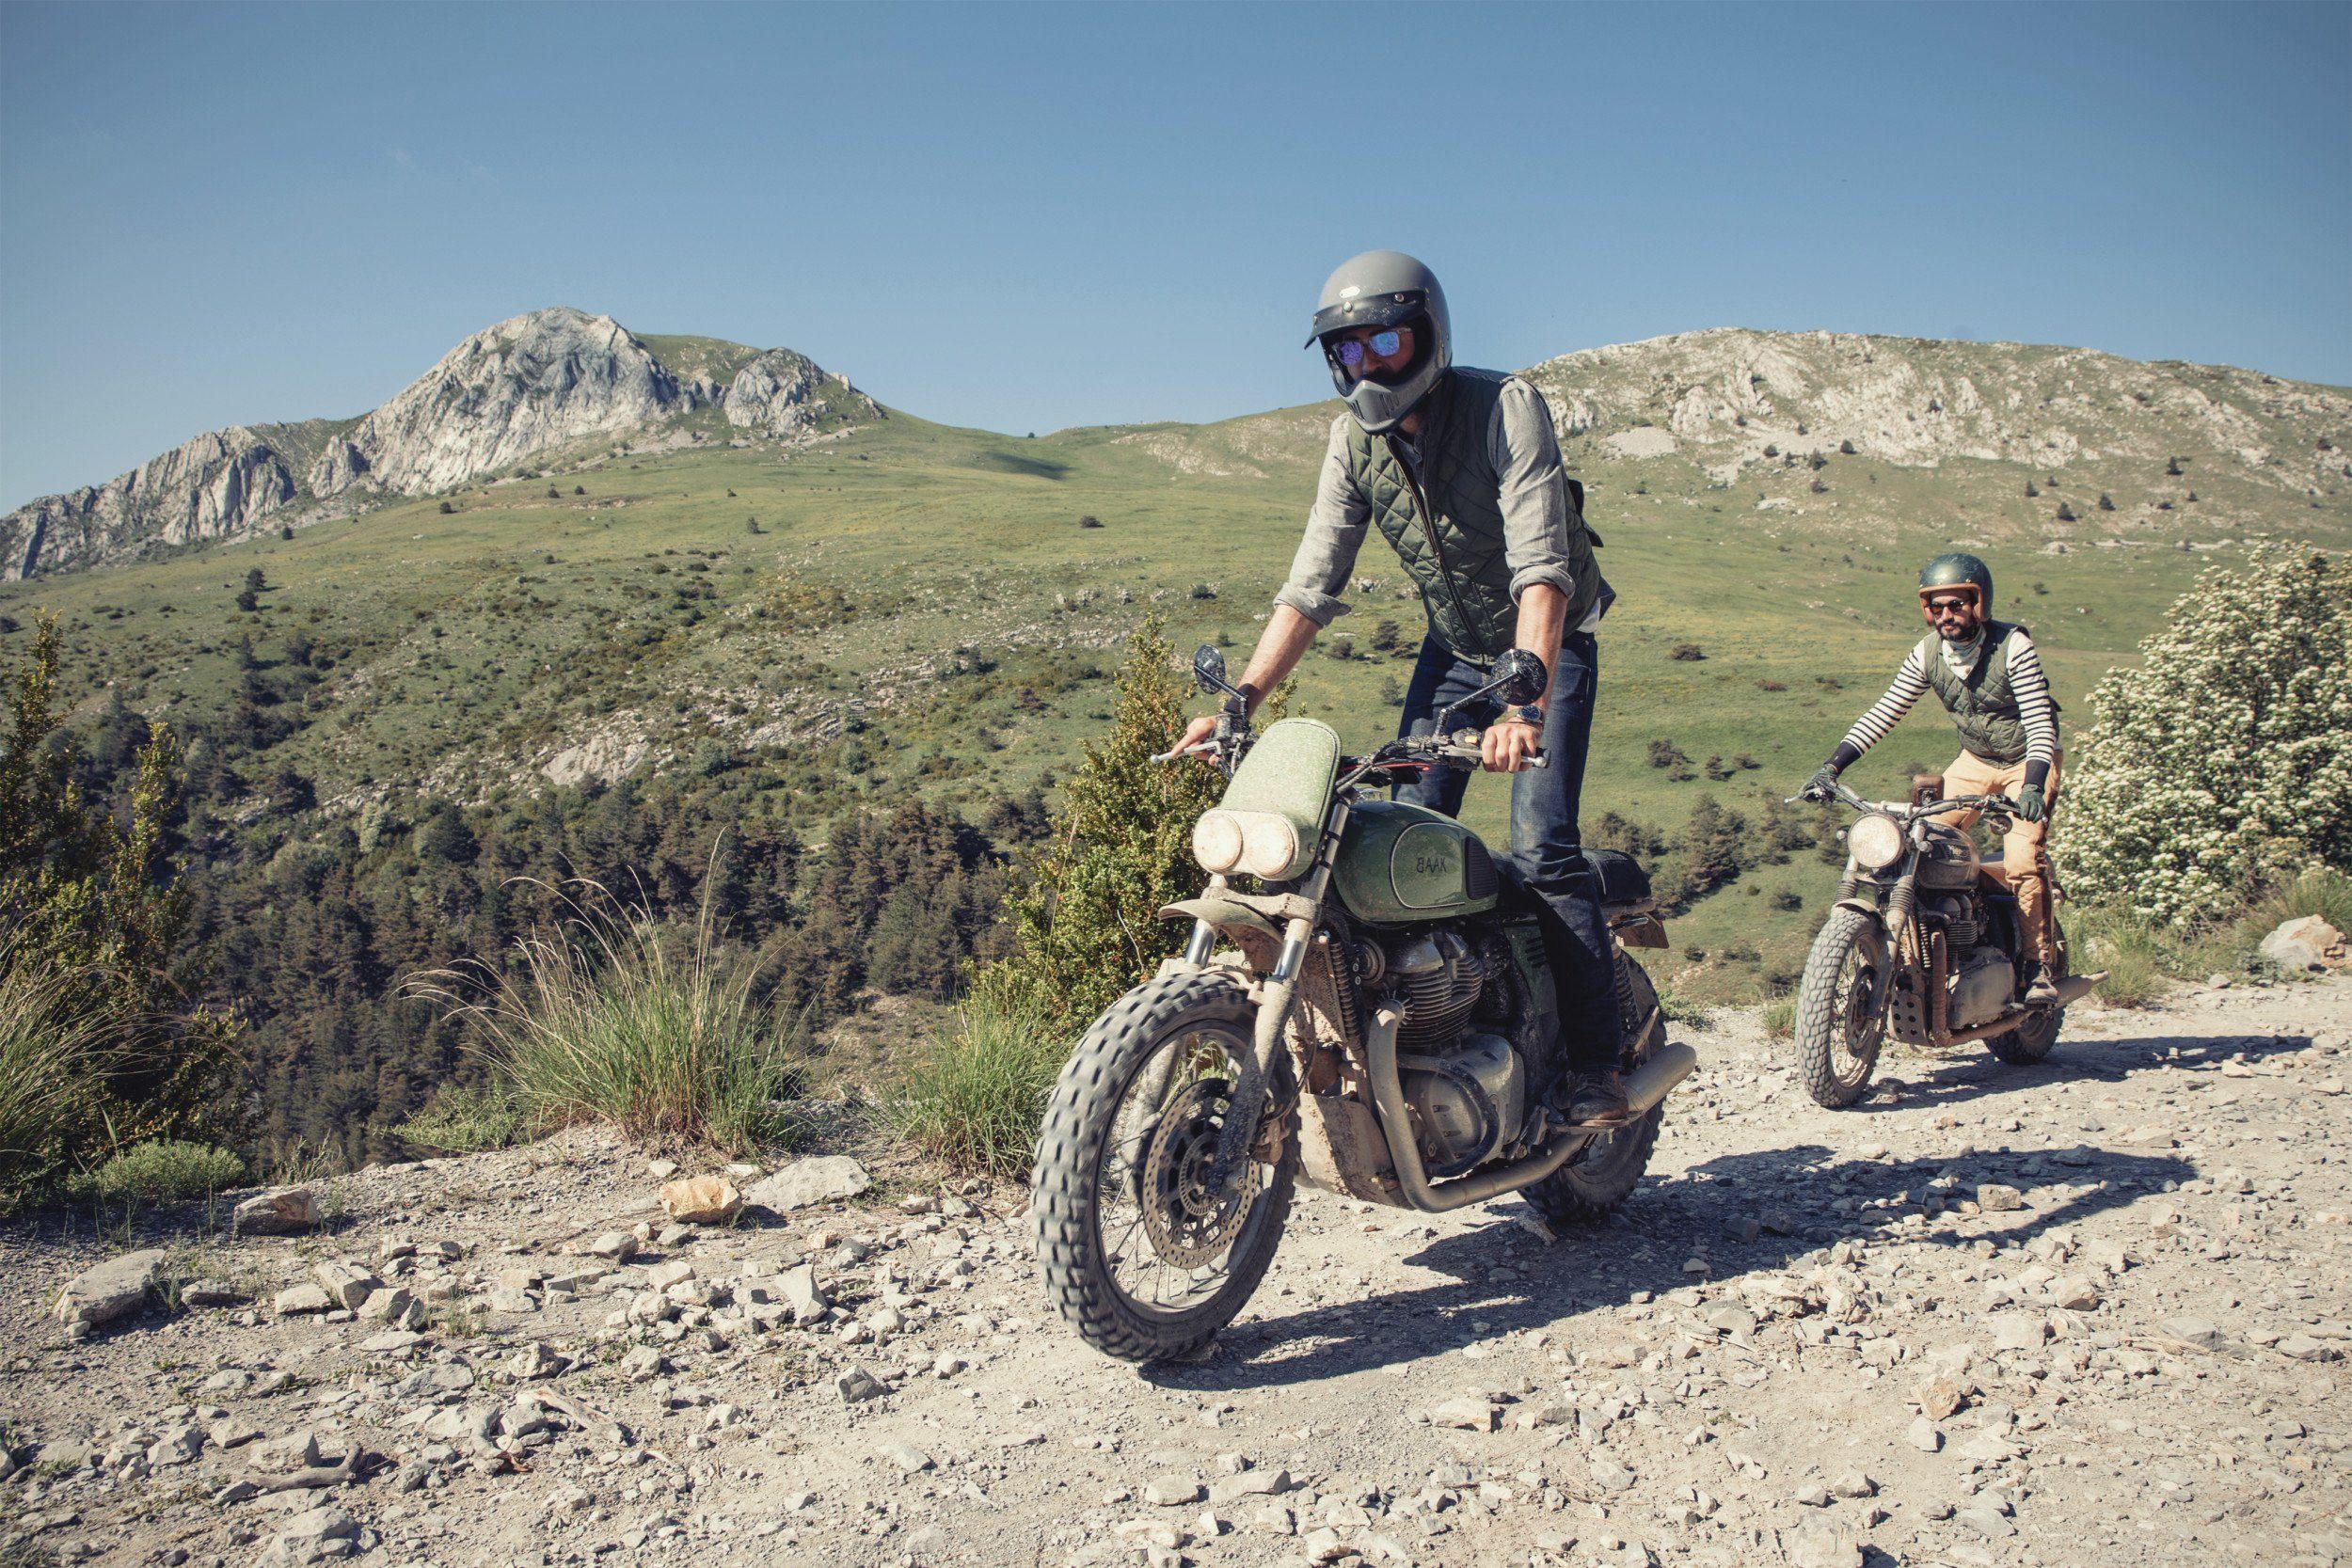 Motorcycle road trip Baak Aventures - La Strada Alpina – Across Italy's Alpine Tracks